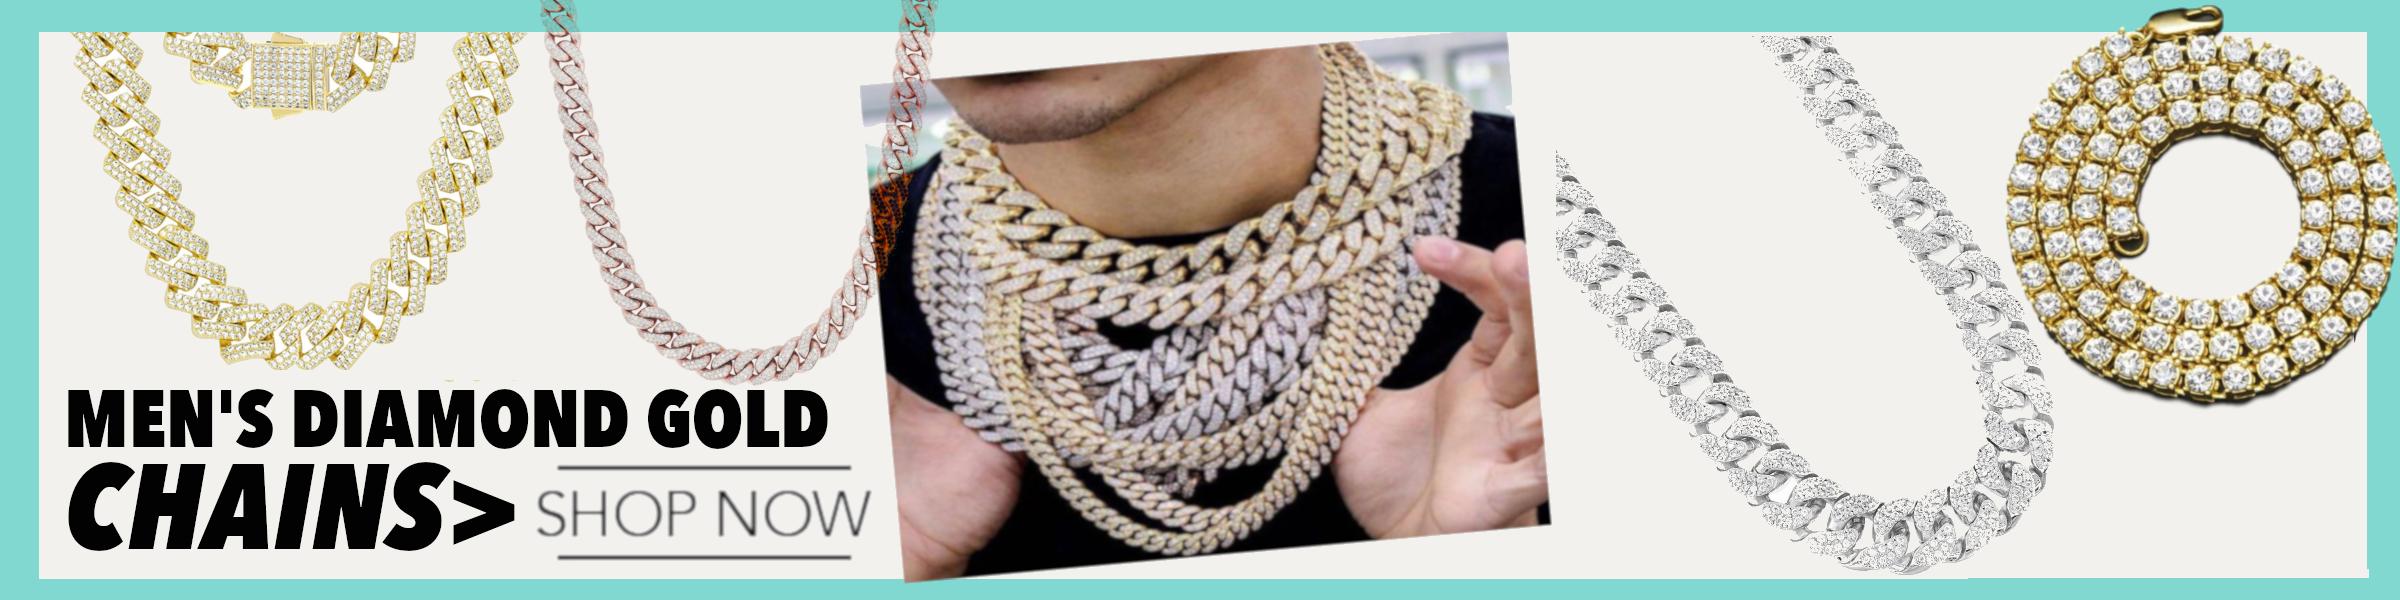 Men Diamonds Chain